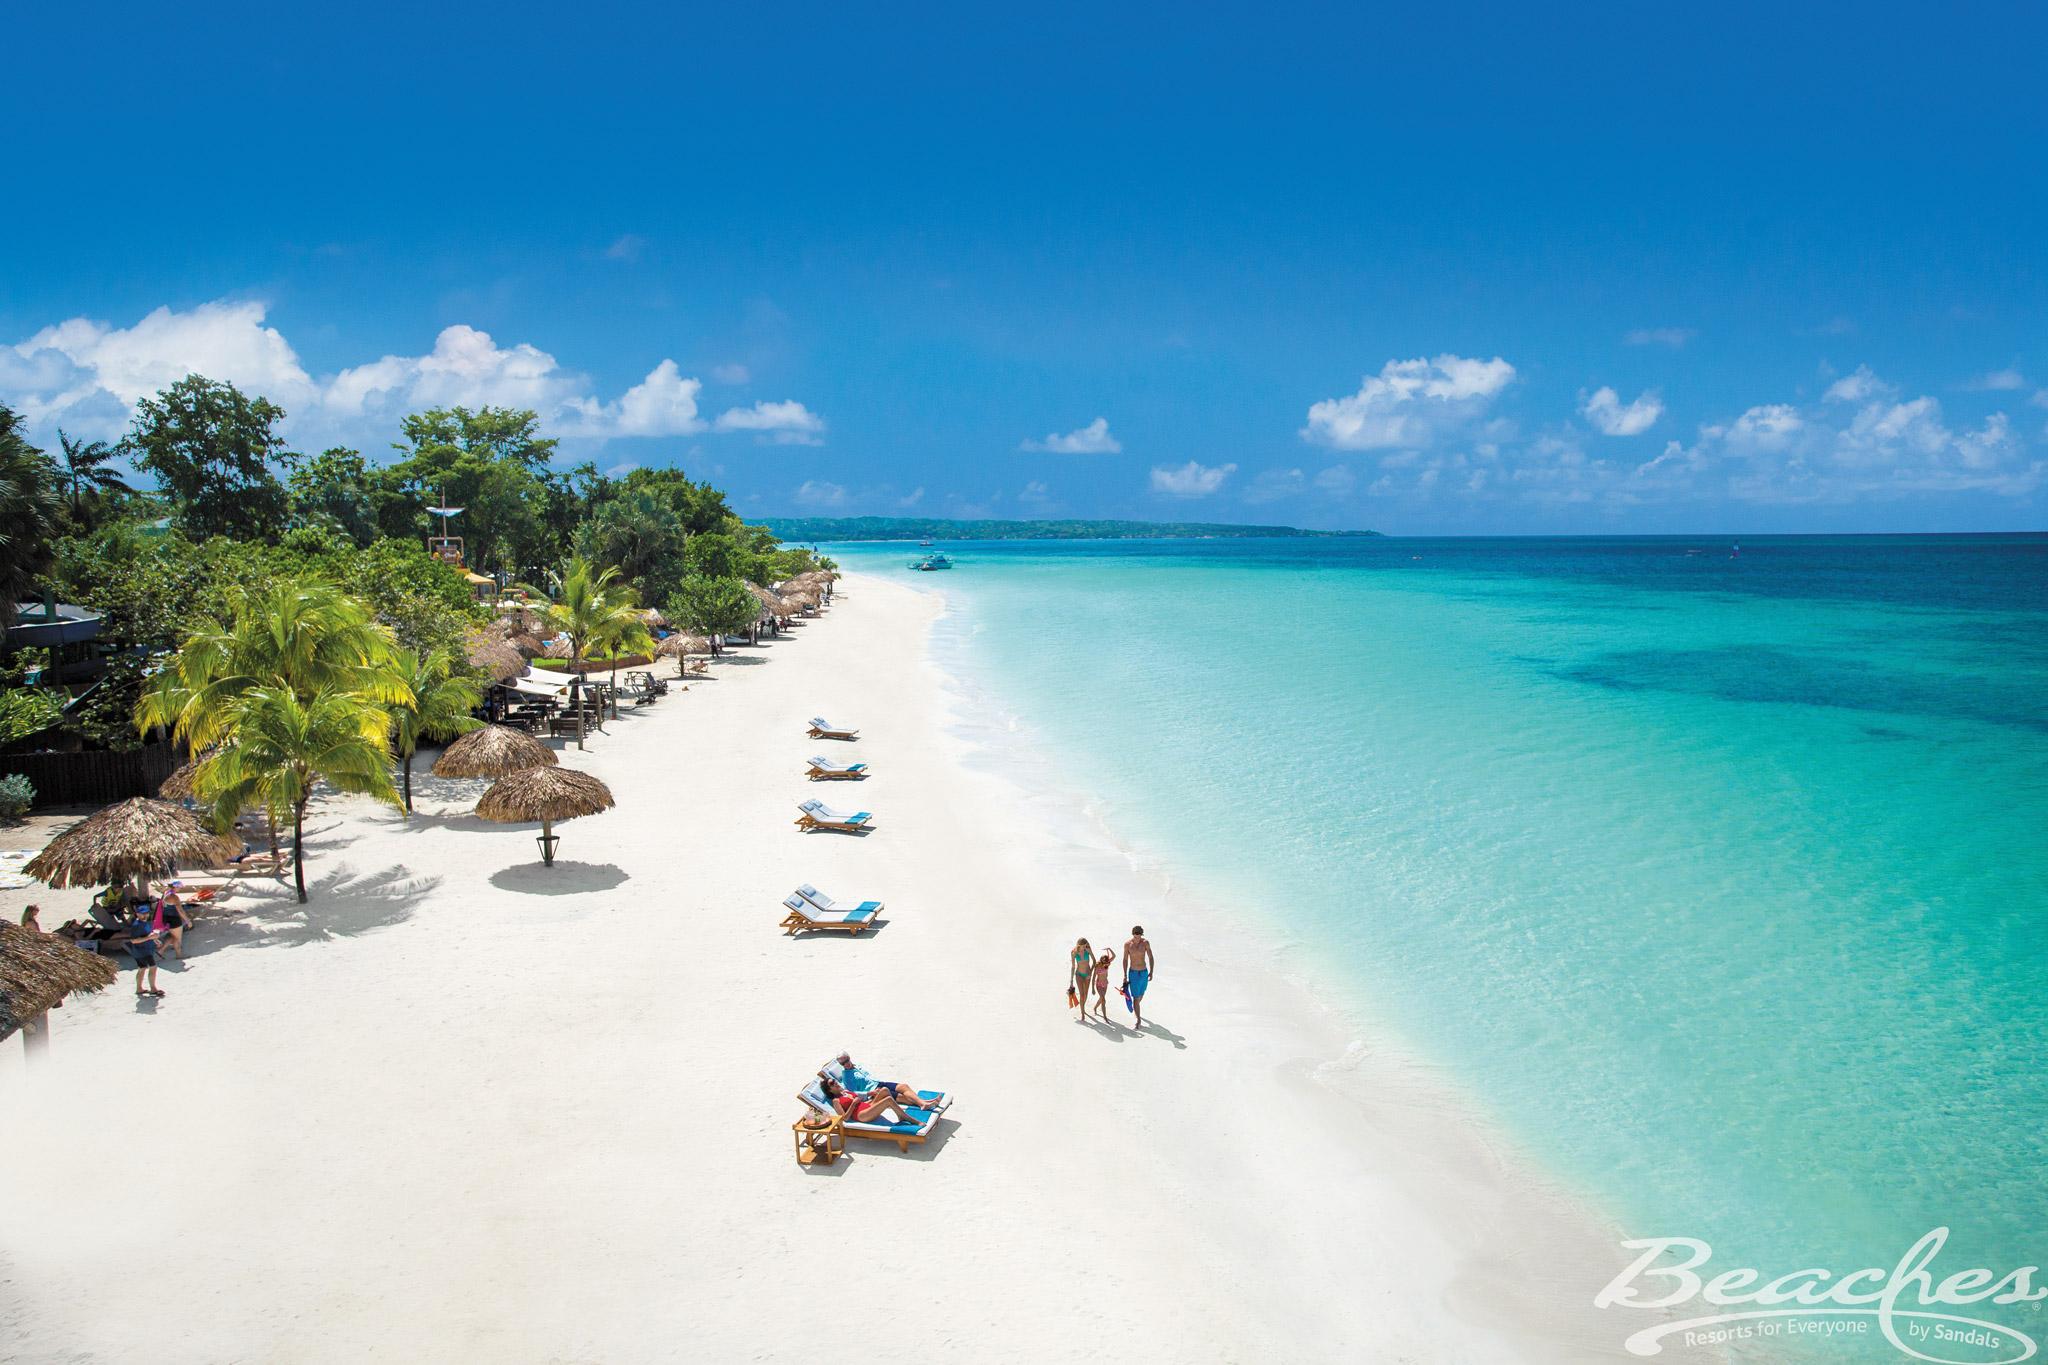 Rooms Beaches Negril Resort Amp Spa Negril Transat